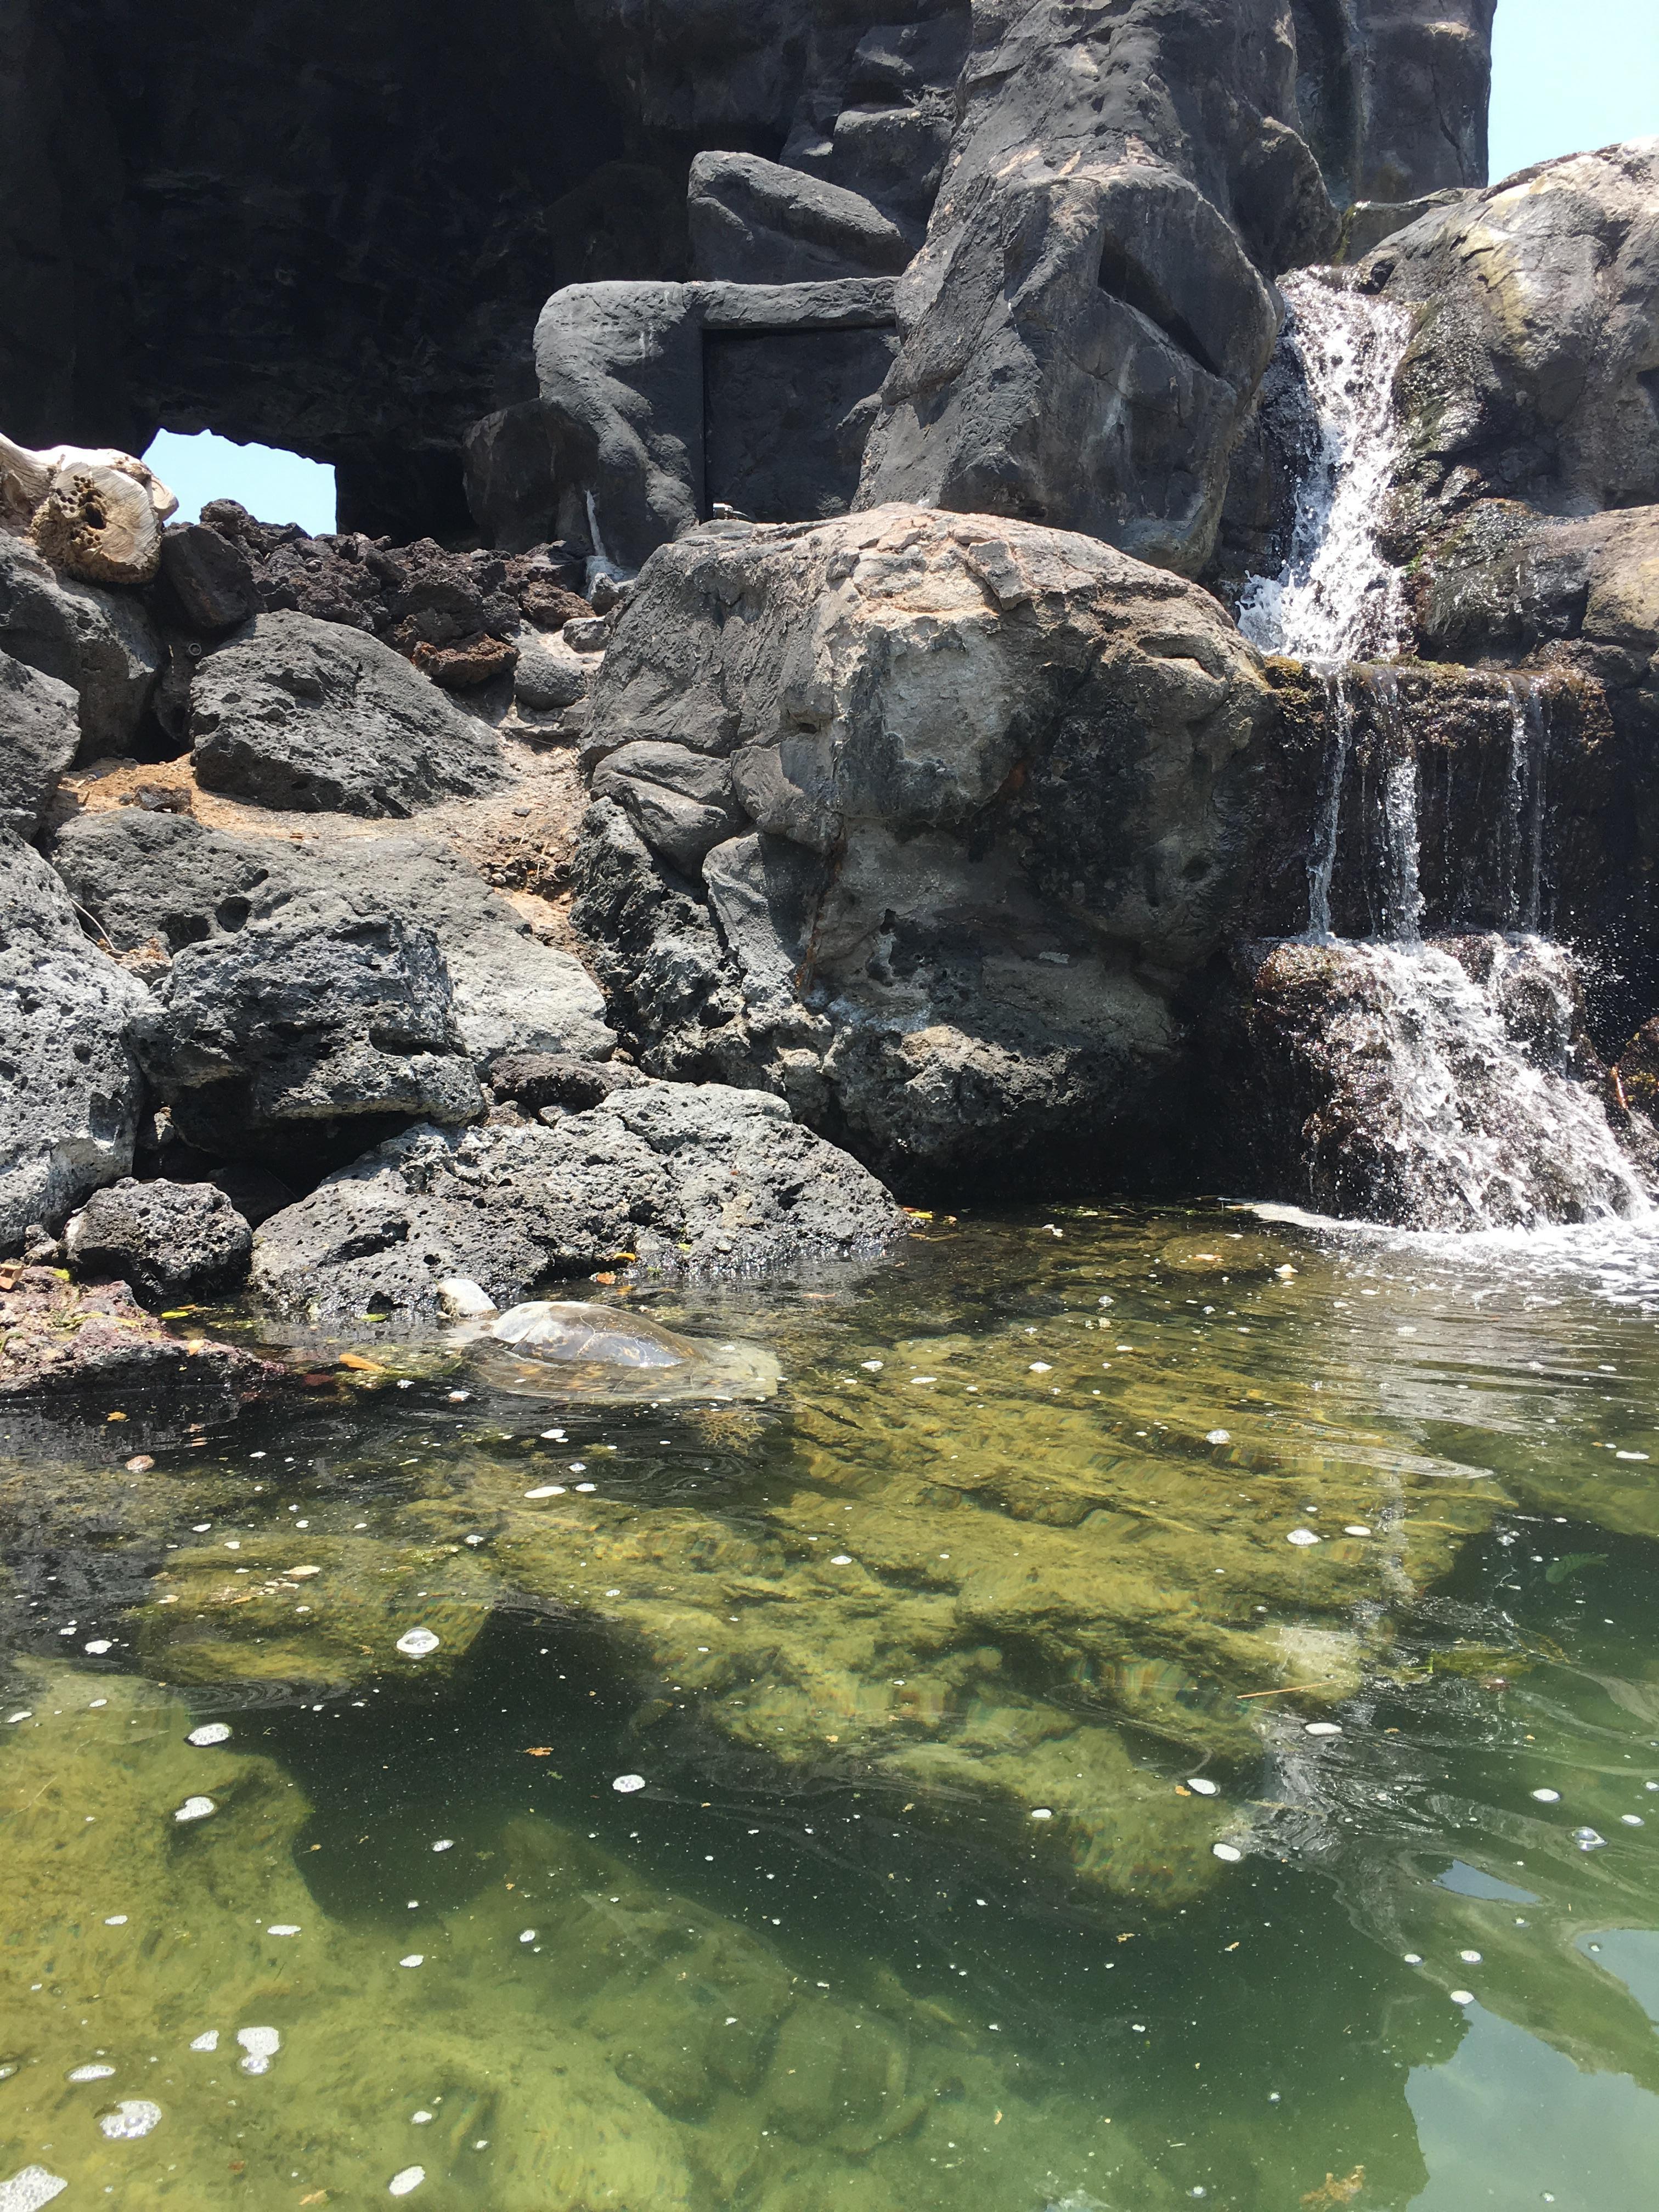 Snorkeling for sea turtles